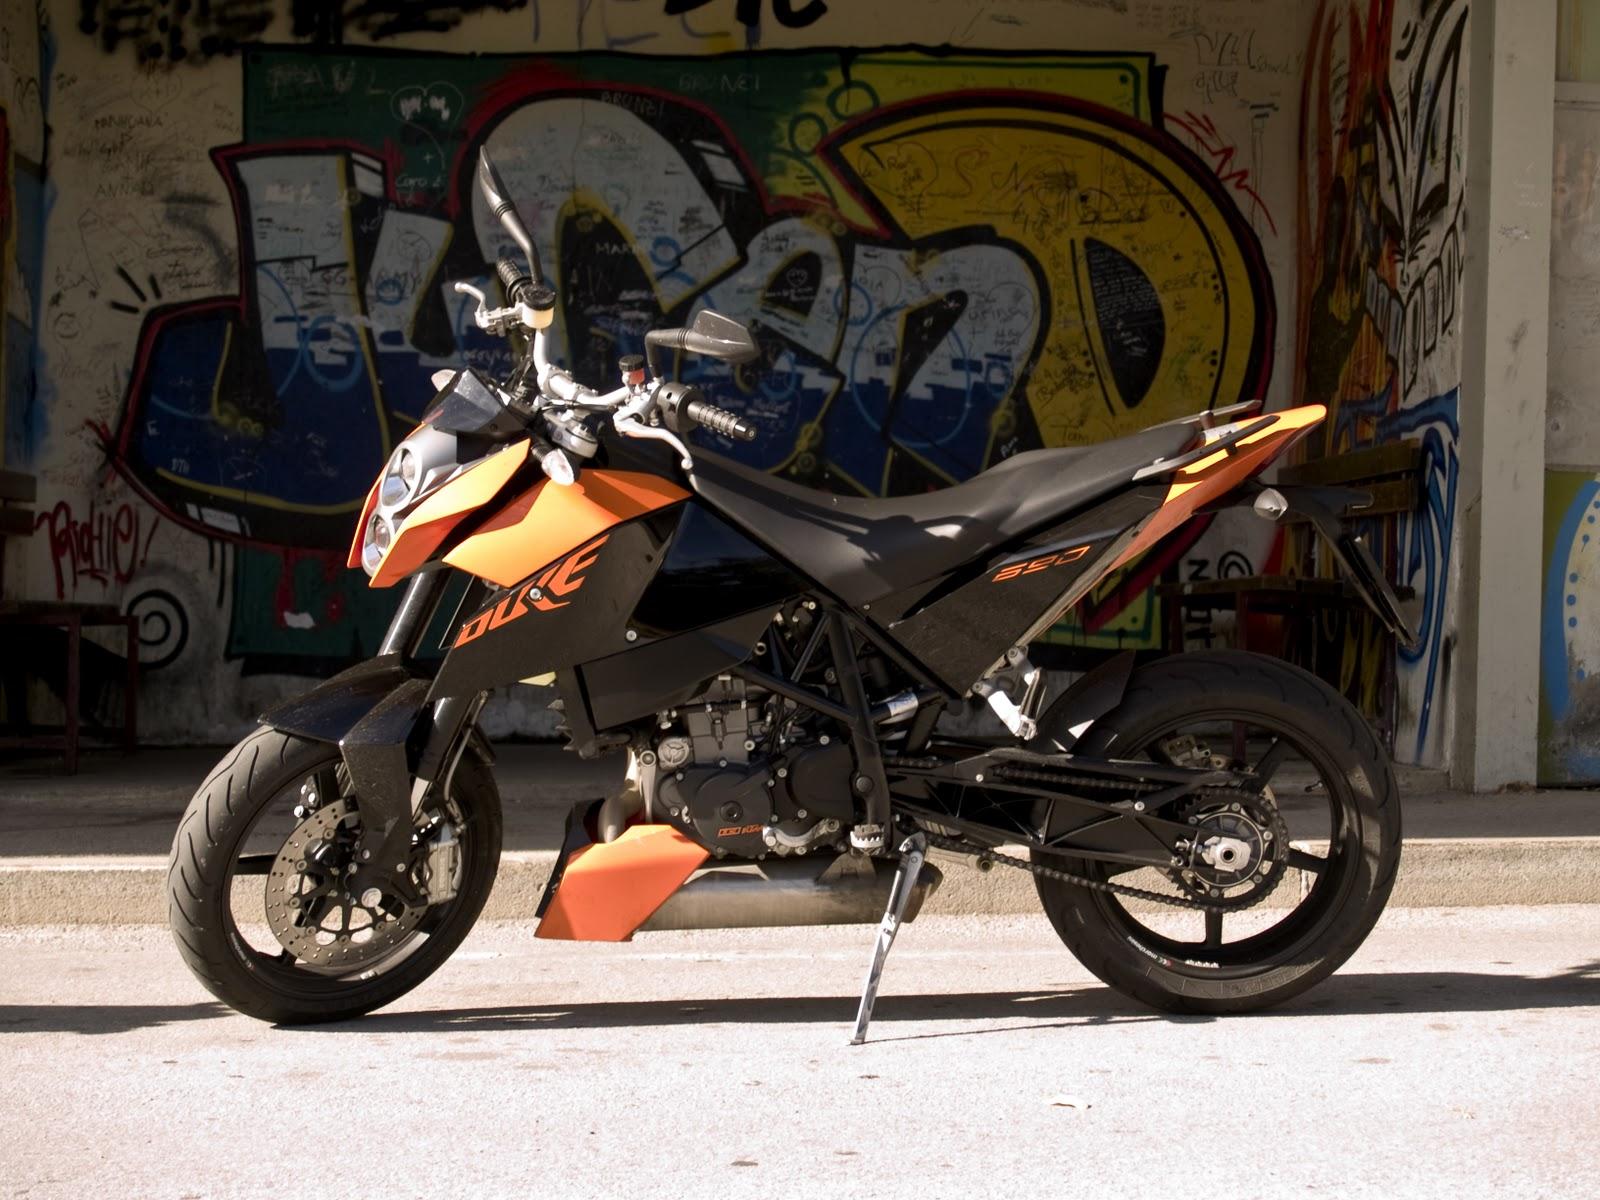 http://4.bp.blogspot.com/_QEKFOK_r_p4/TUAqIqPUxvI/AAAAAAAABQE/Cg-uWN7yXI4/s1600/Ktm-690-duke-%2528duke3%2529-lc4-2008+motorcycle+motormodi-blogspot-com.jpg